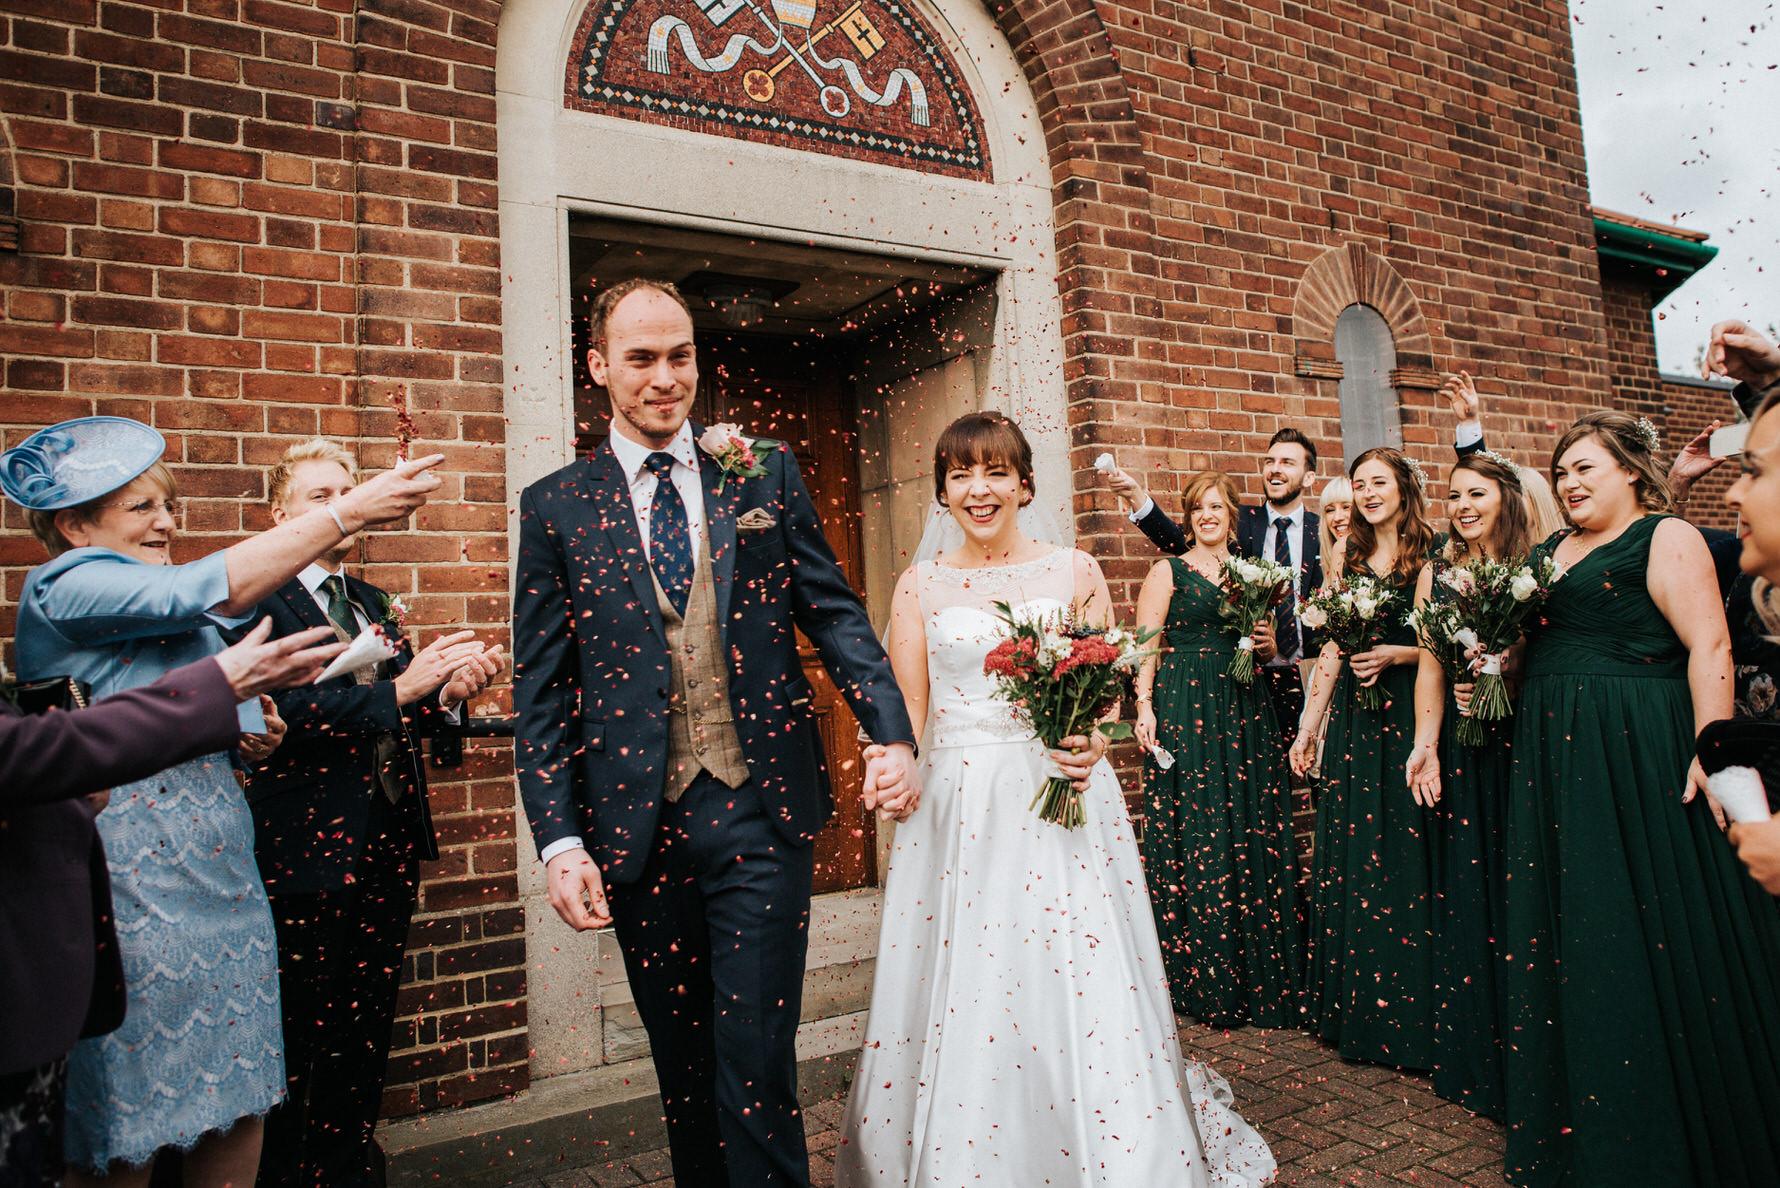 Cheshire Documentary Wedding Photography - Bride and Groom Confetti shot